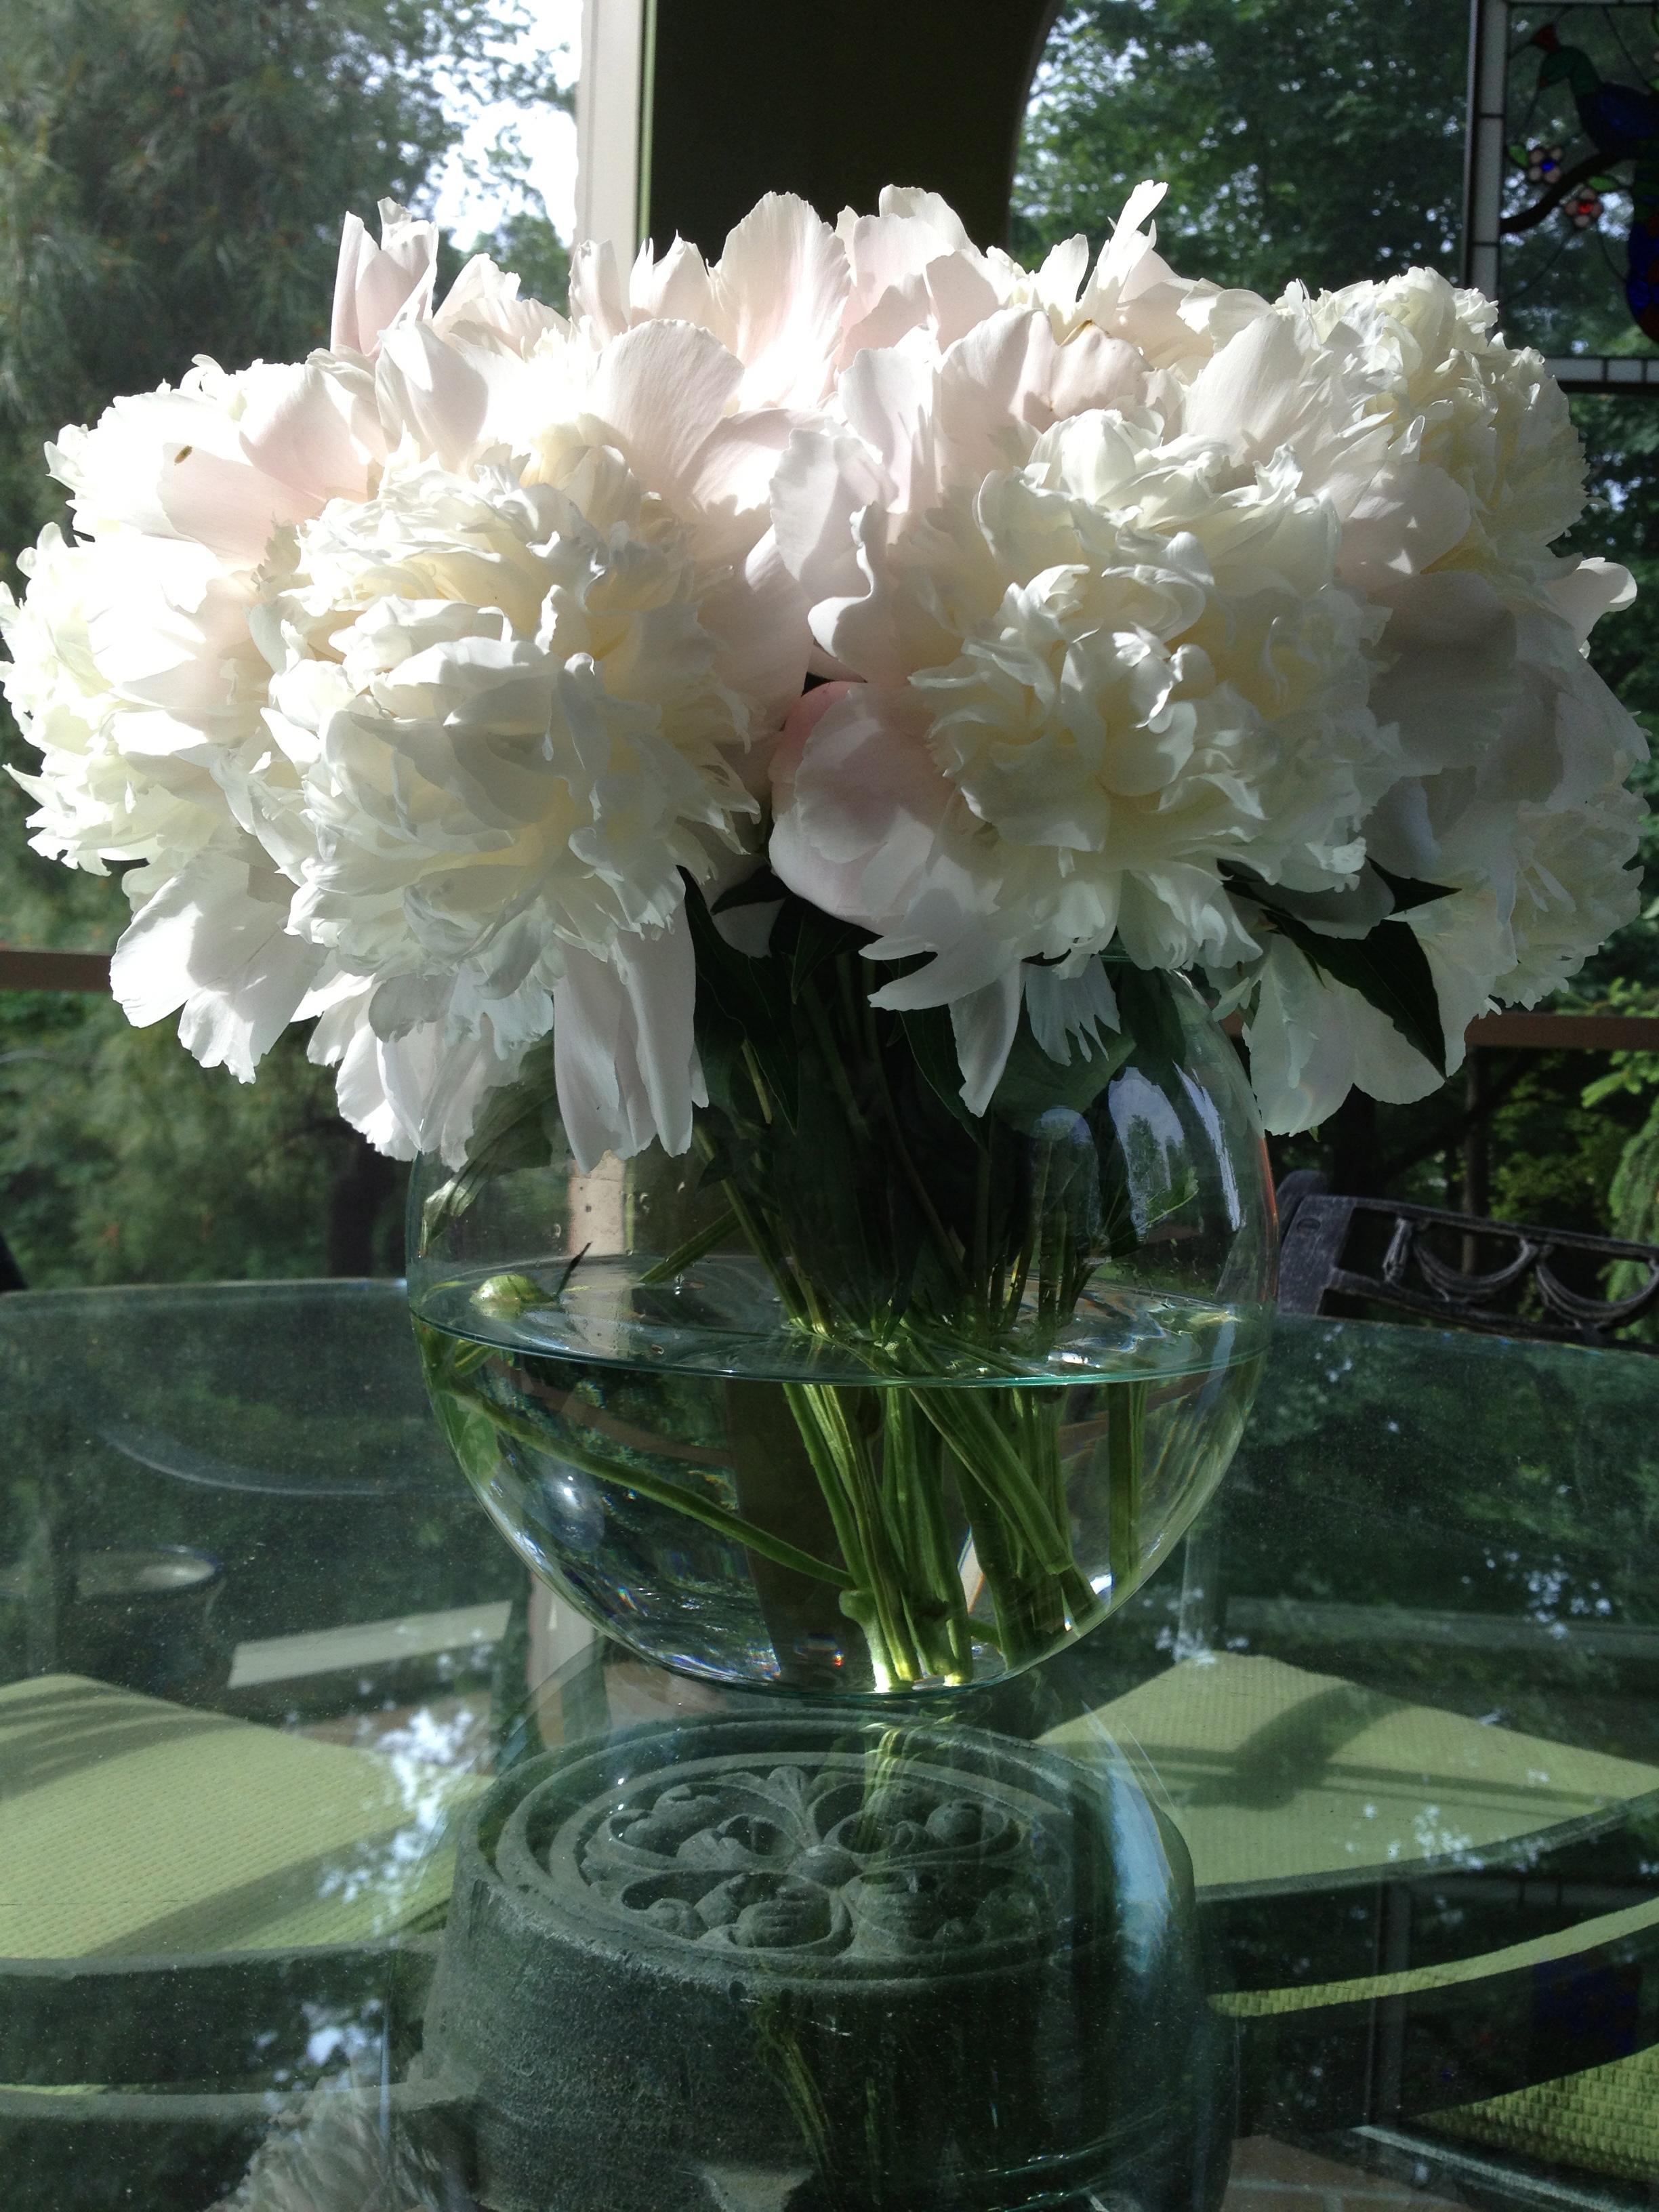 From Garden To Vase Summer Floral Arrangements Omg